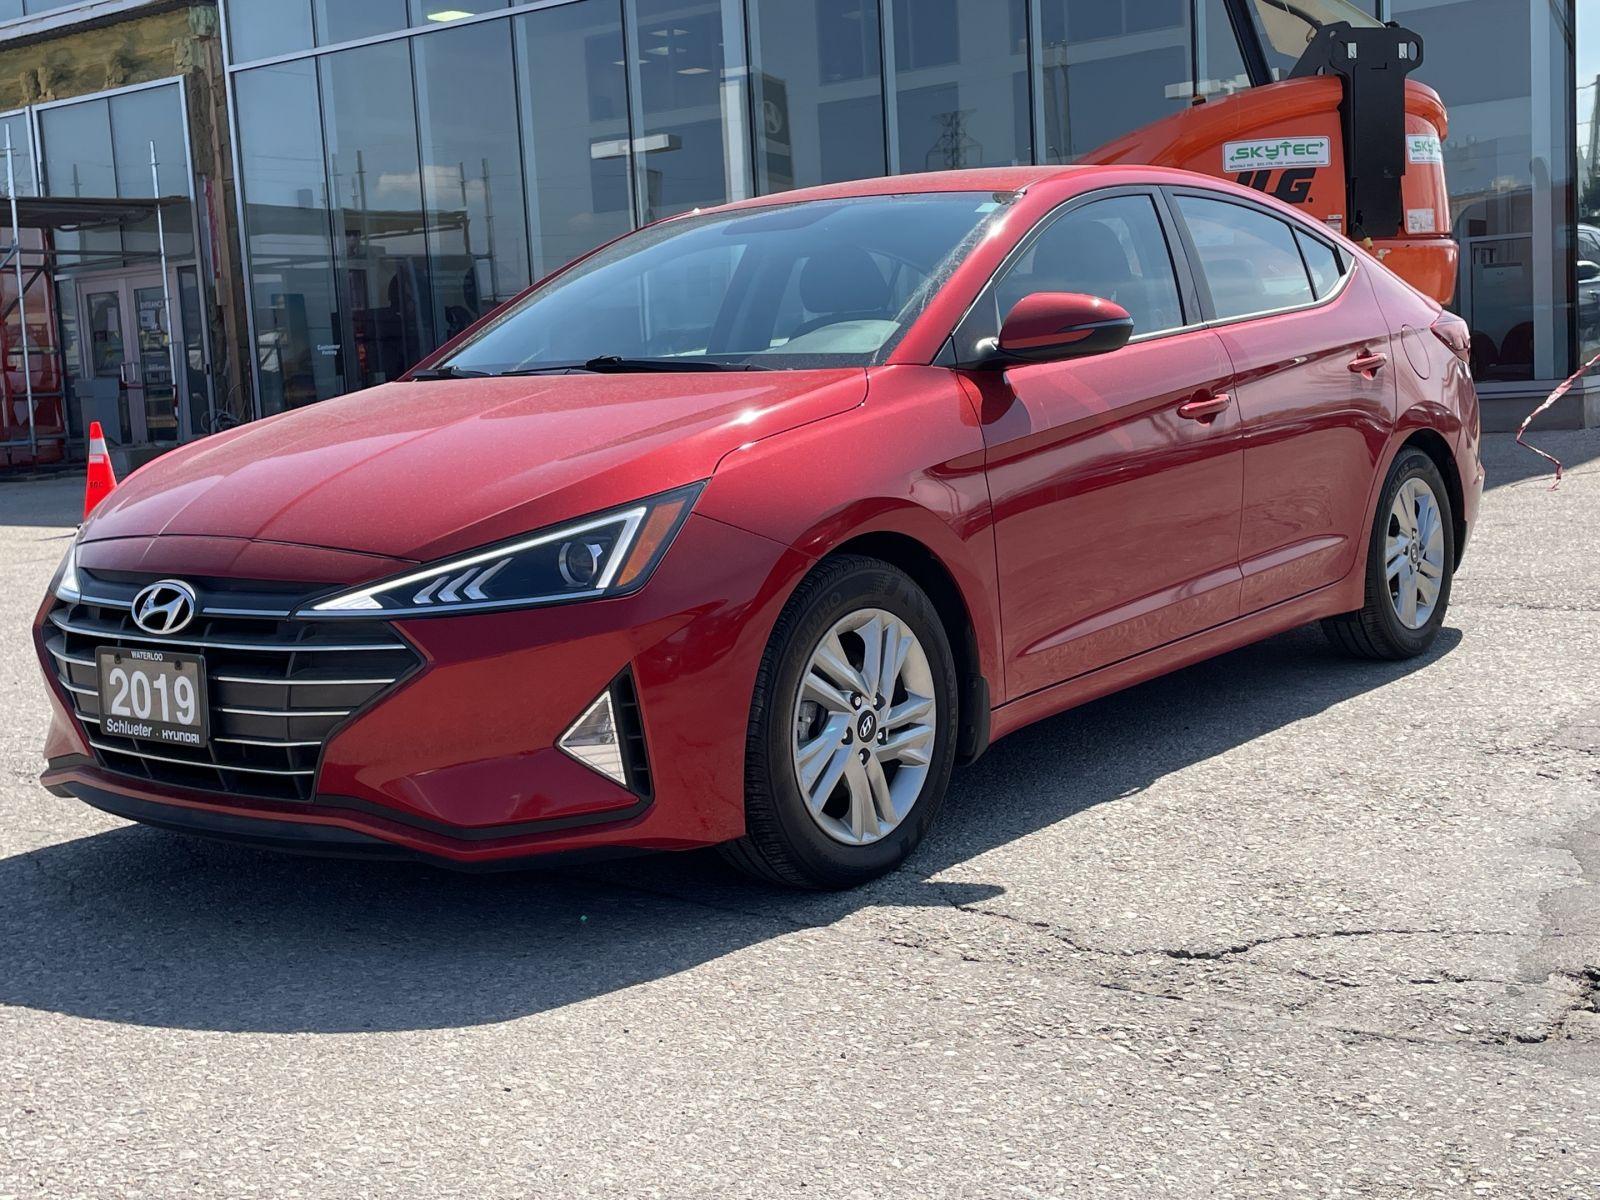 2019 Hyundai Elantra Image